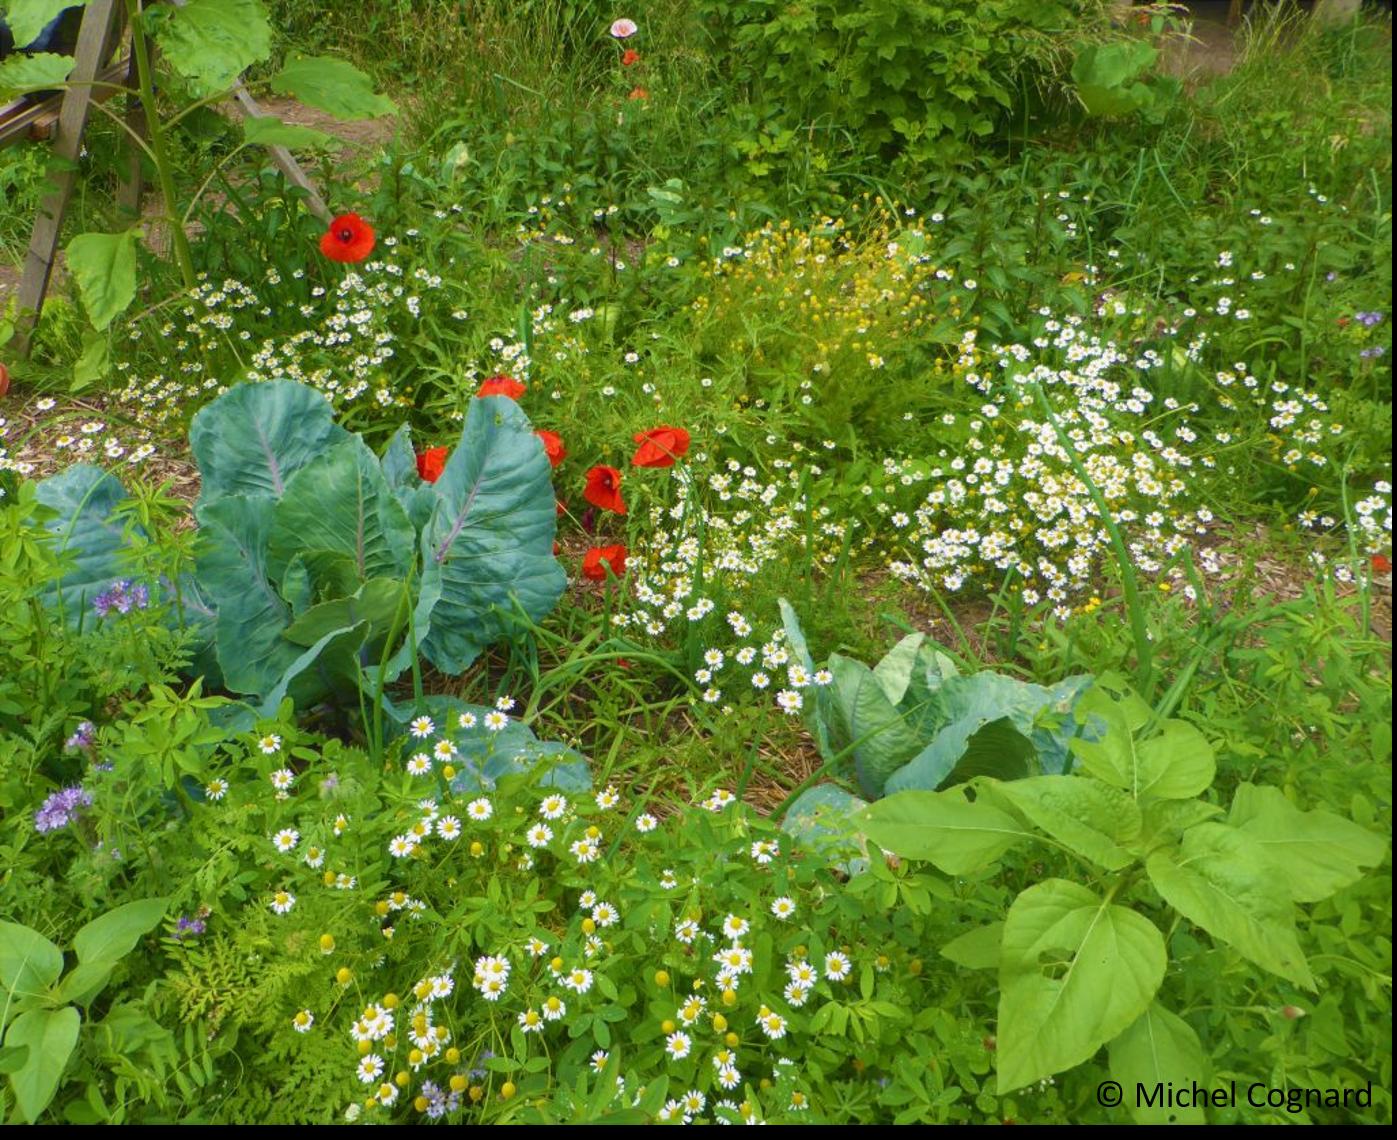 La biodiversité fleurie au jardin (© Michel Cognard).jpg